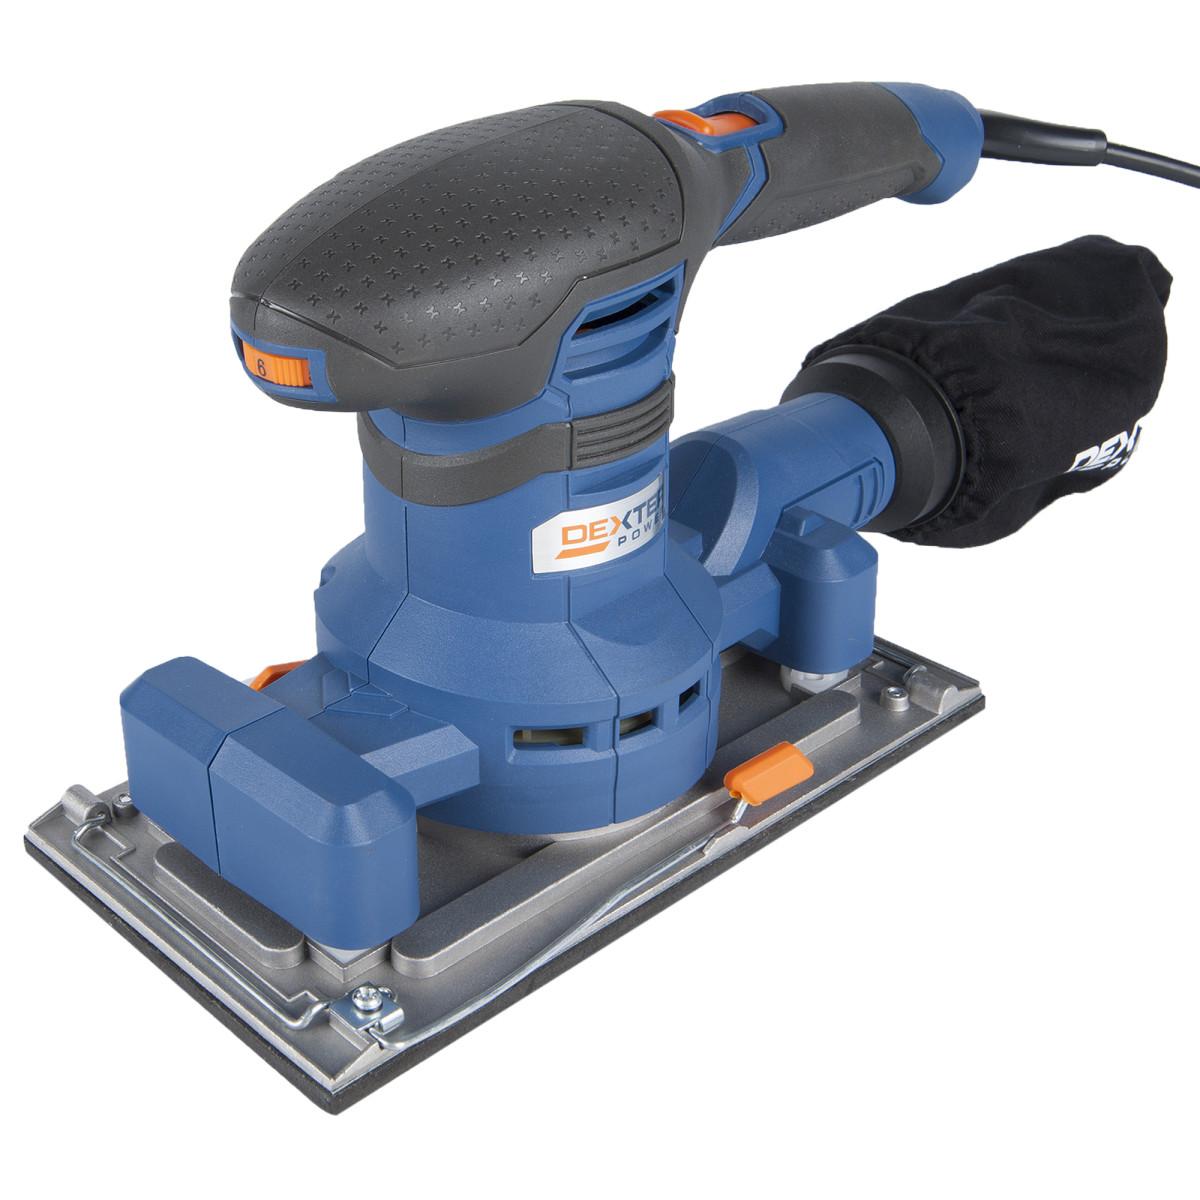 Вибрационная шлифмашина Dexter Power NC300ES 300 Вт